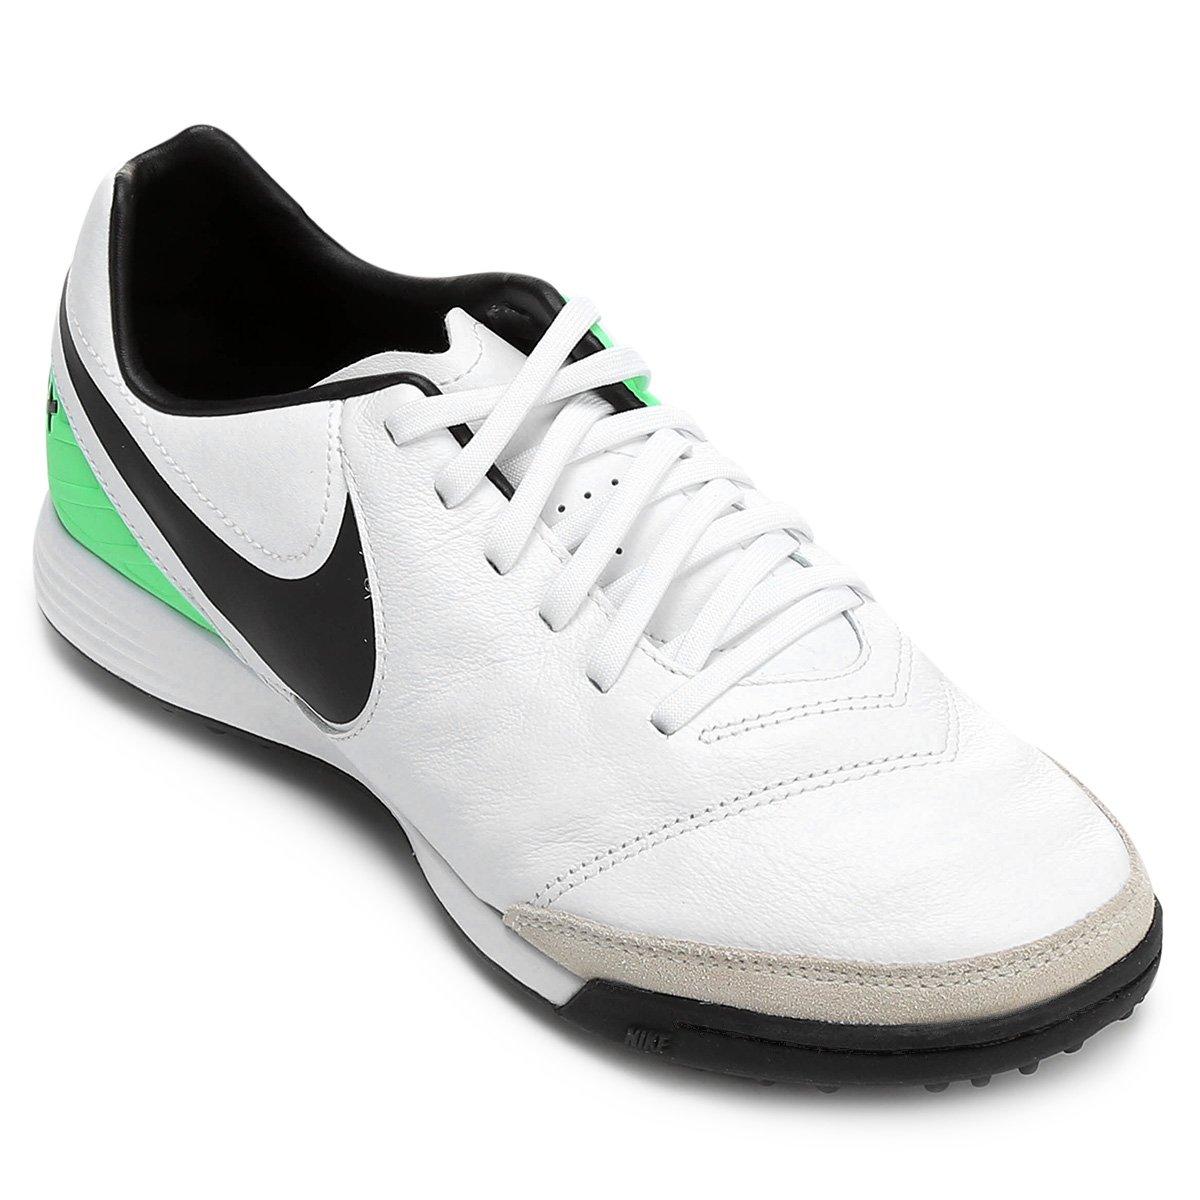 55a2a35298d43 Chuteira Society Nike Tiempo Mystic 5 TF - Branco e Verde - Compre Agora